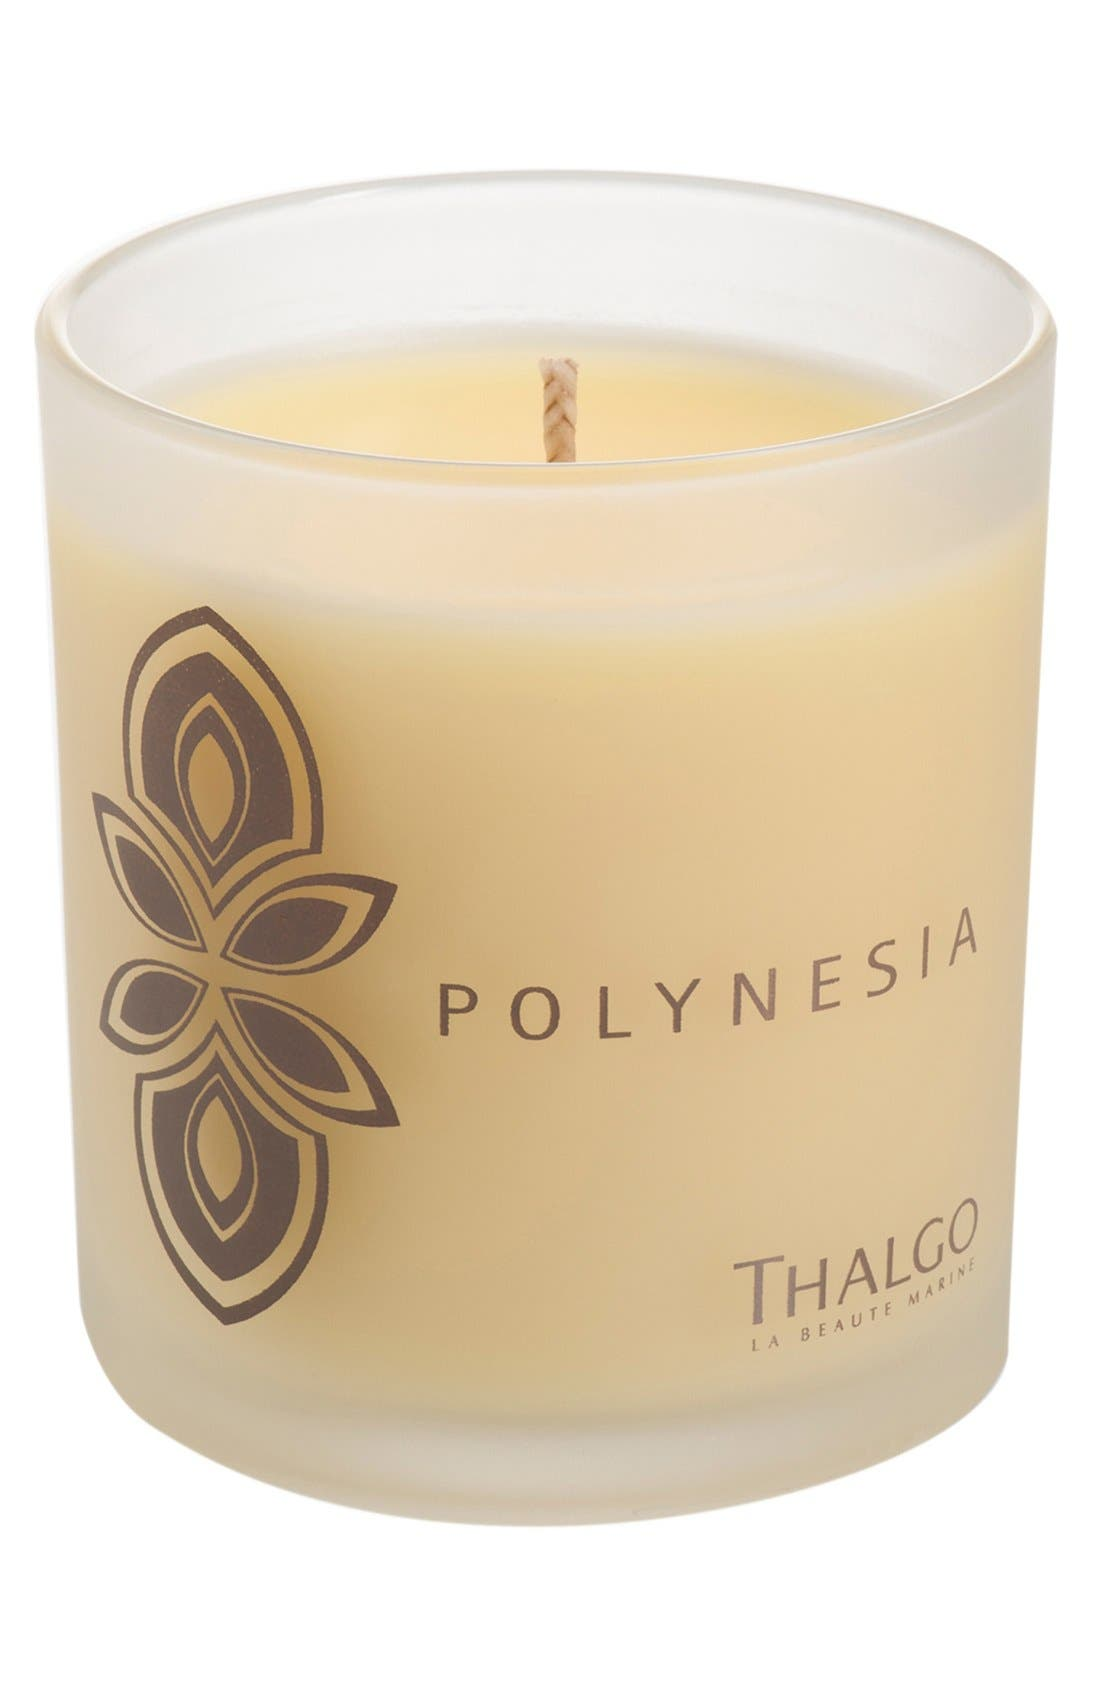 'Polynesia' Scented Candle,                         Main,                         color, No Color